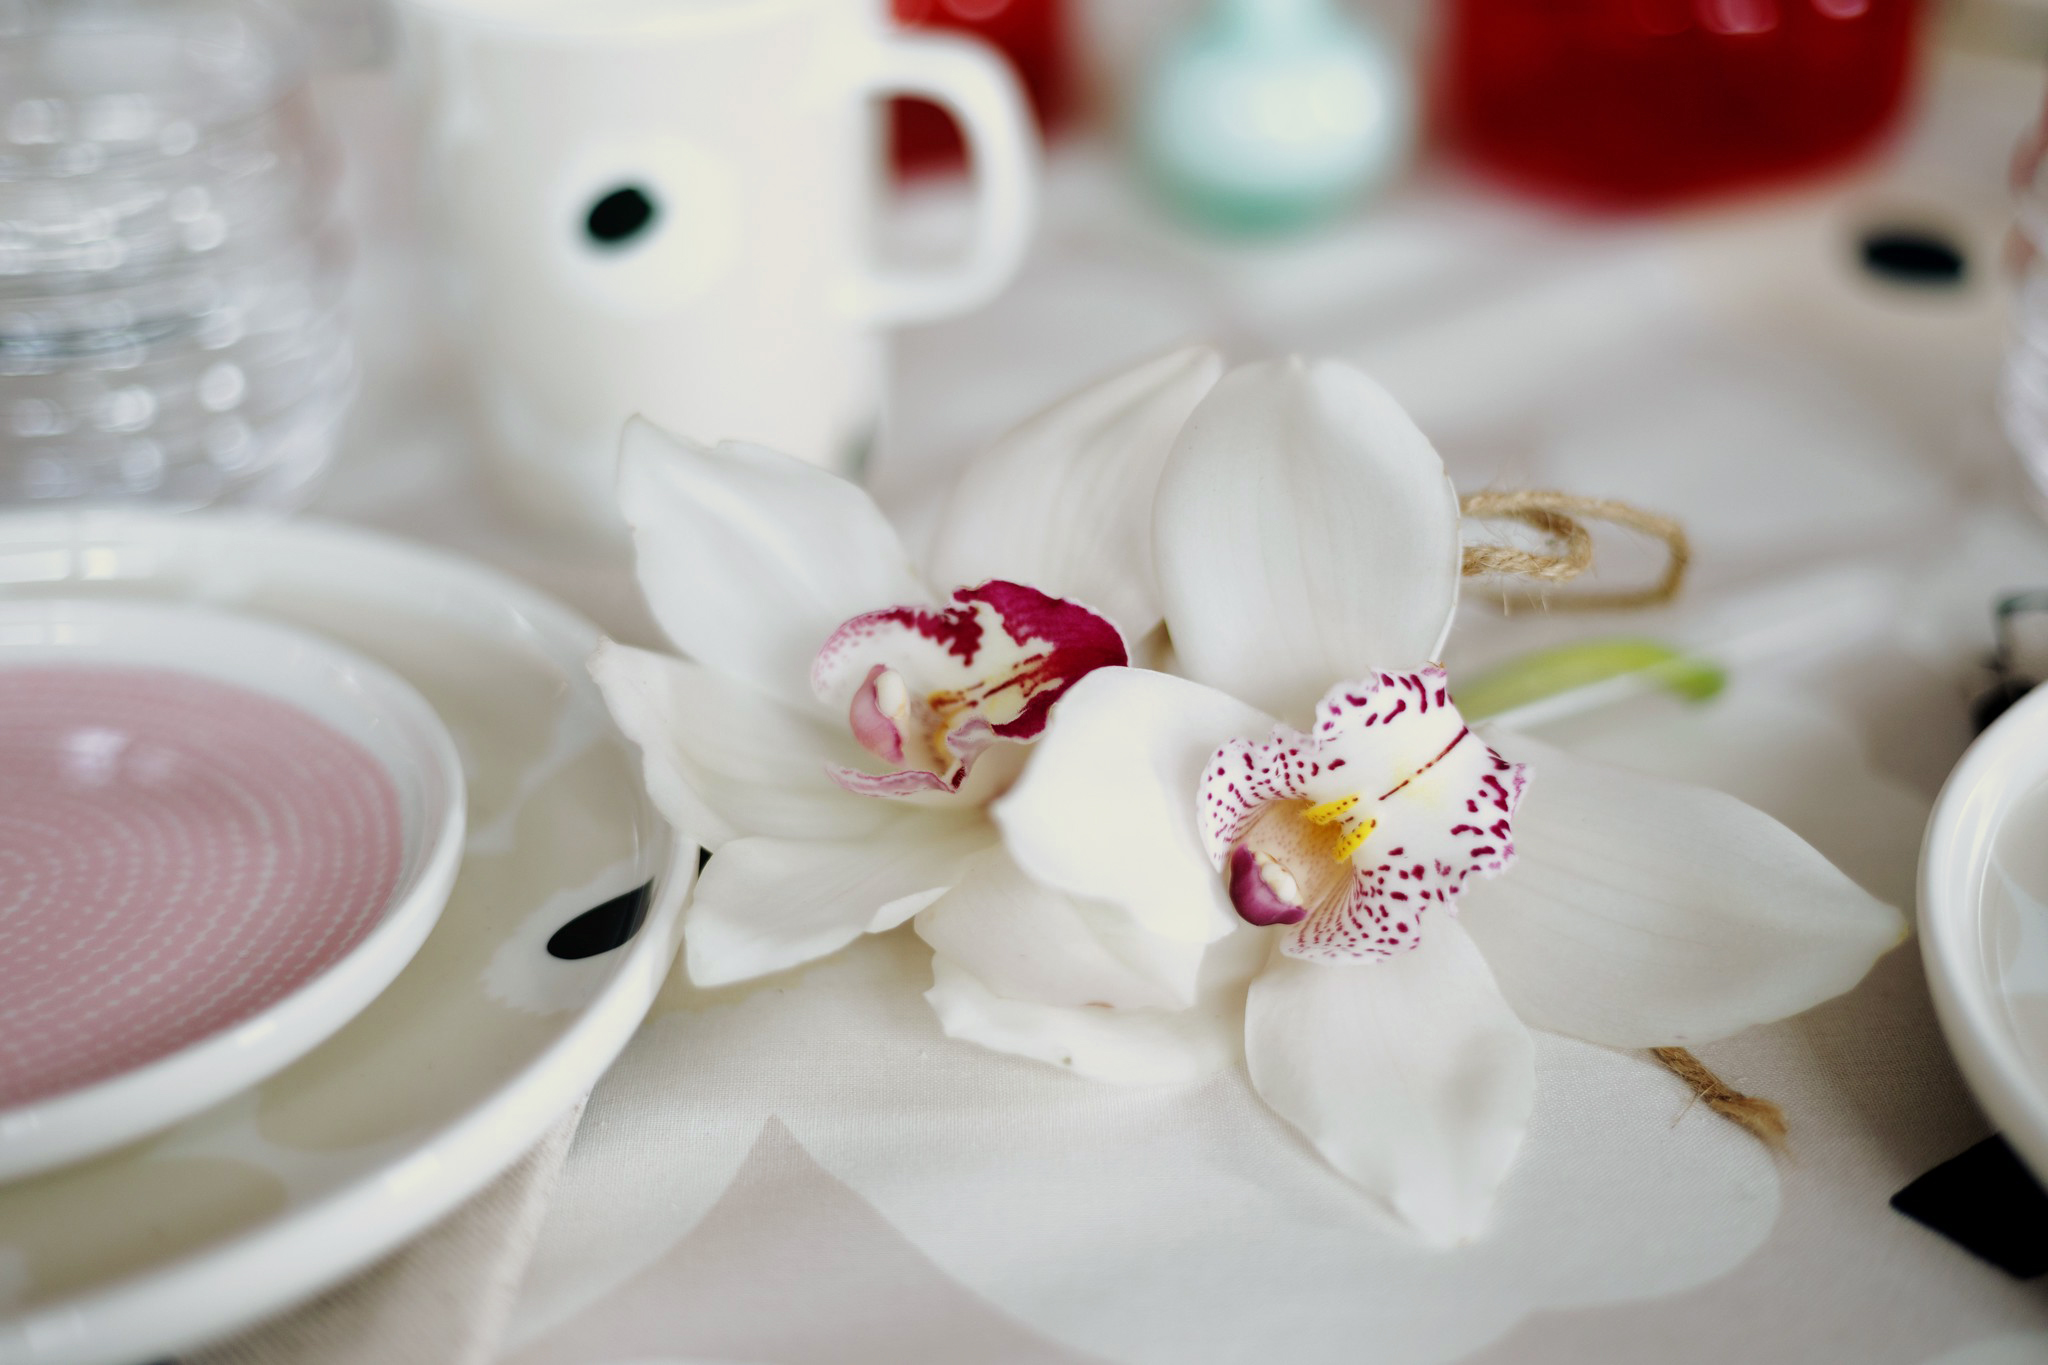 Marimekko flower vase red mini vase mint marimekko porslin oiva unikko beige gul ranunkel